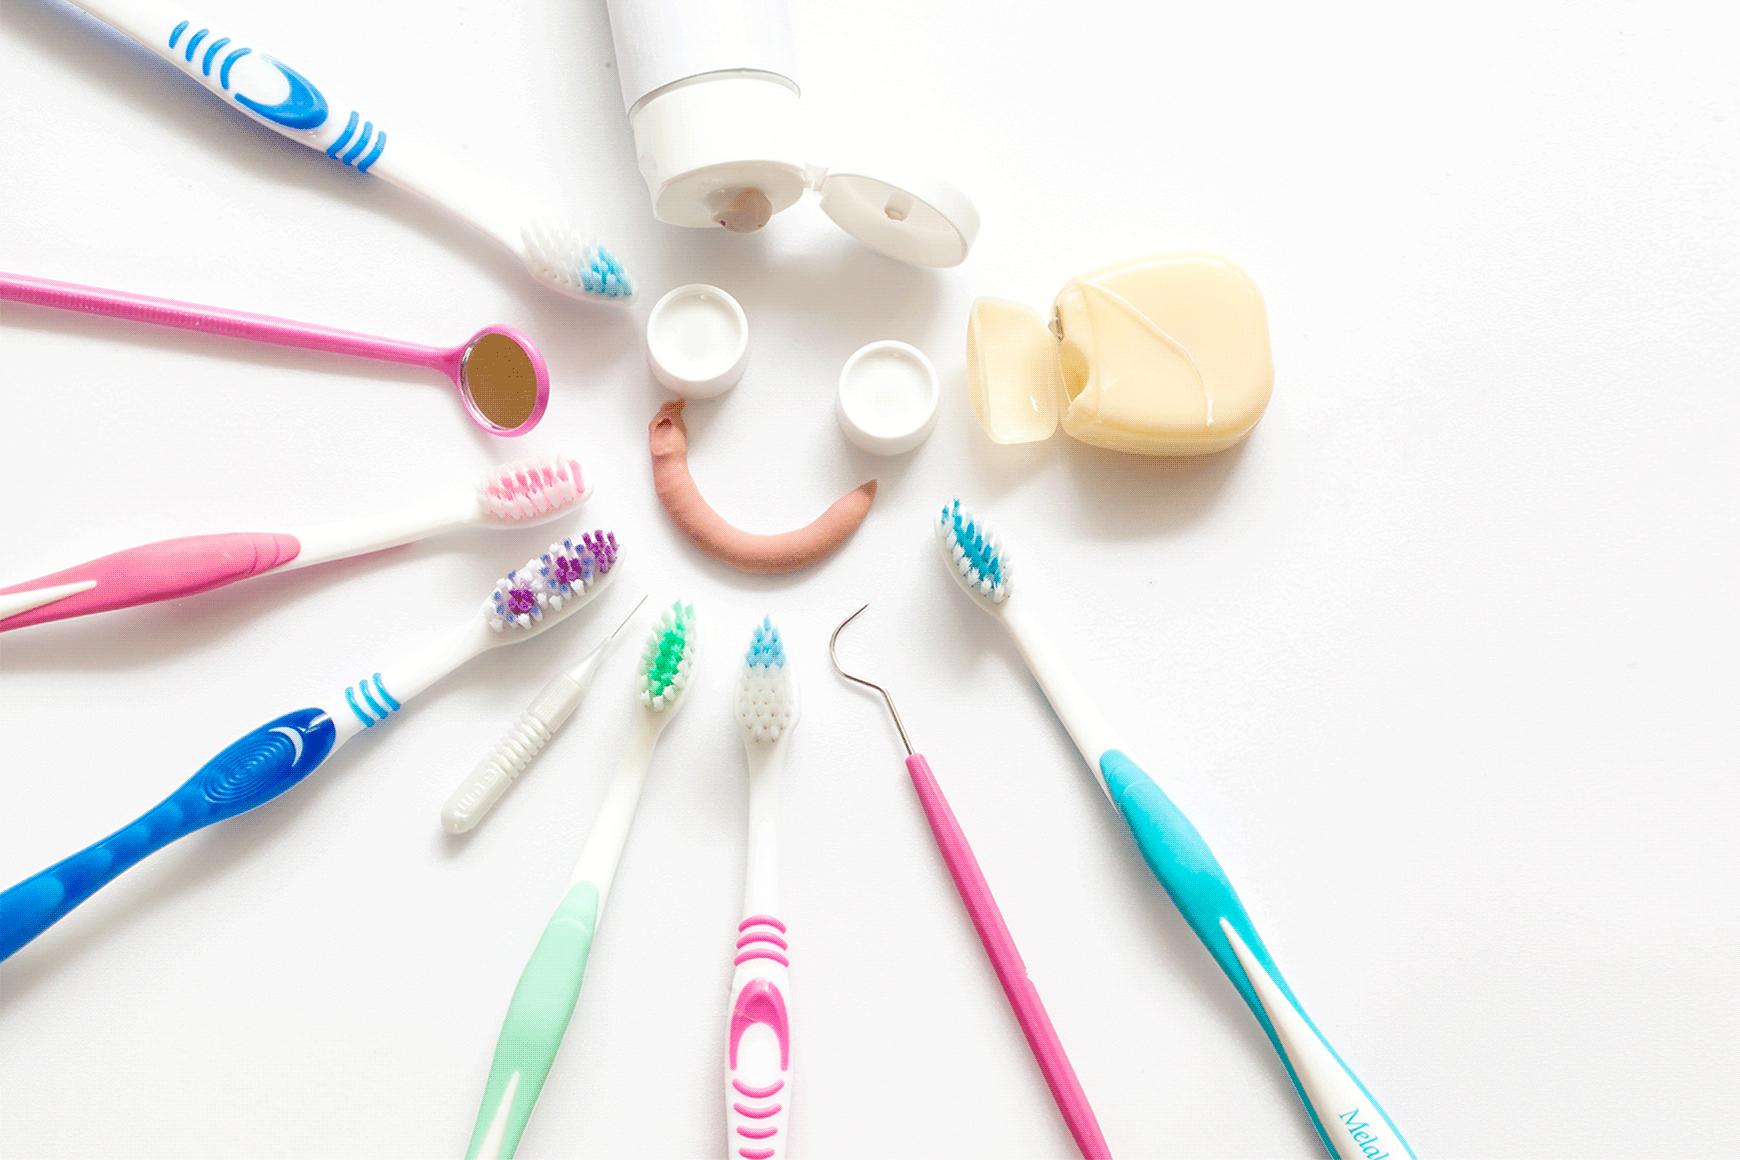 Maintain Good Oral Hygiene